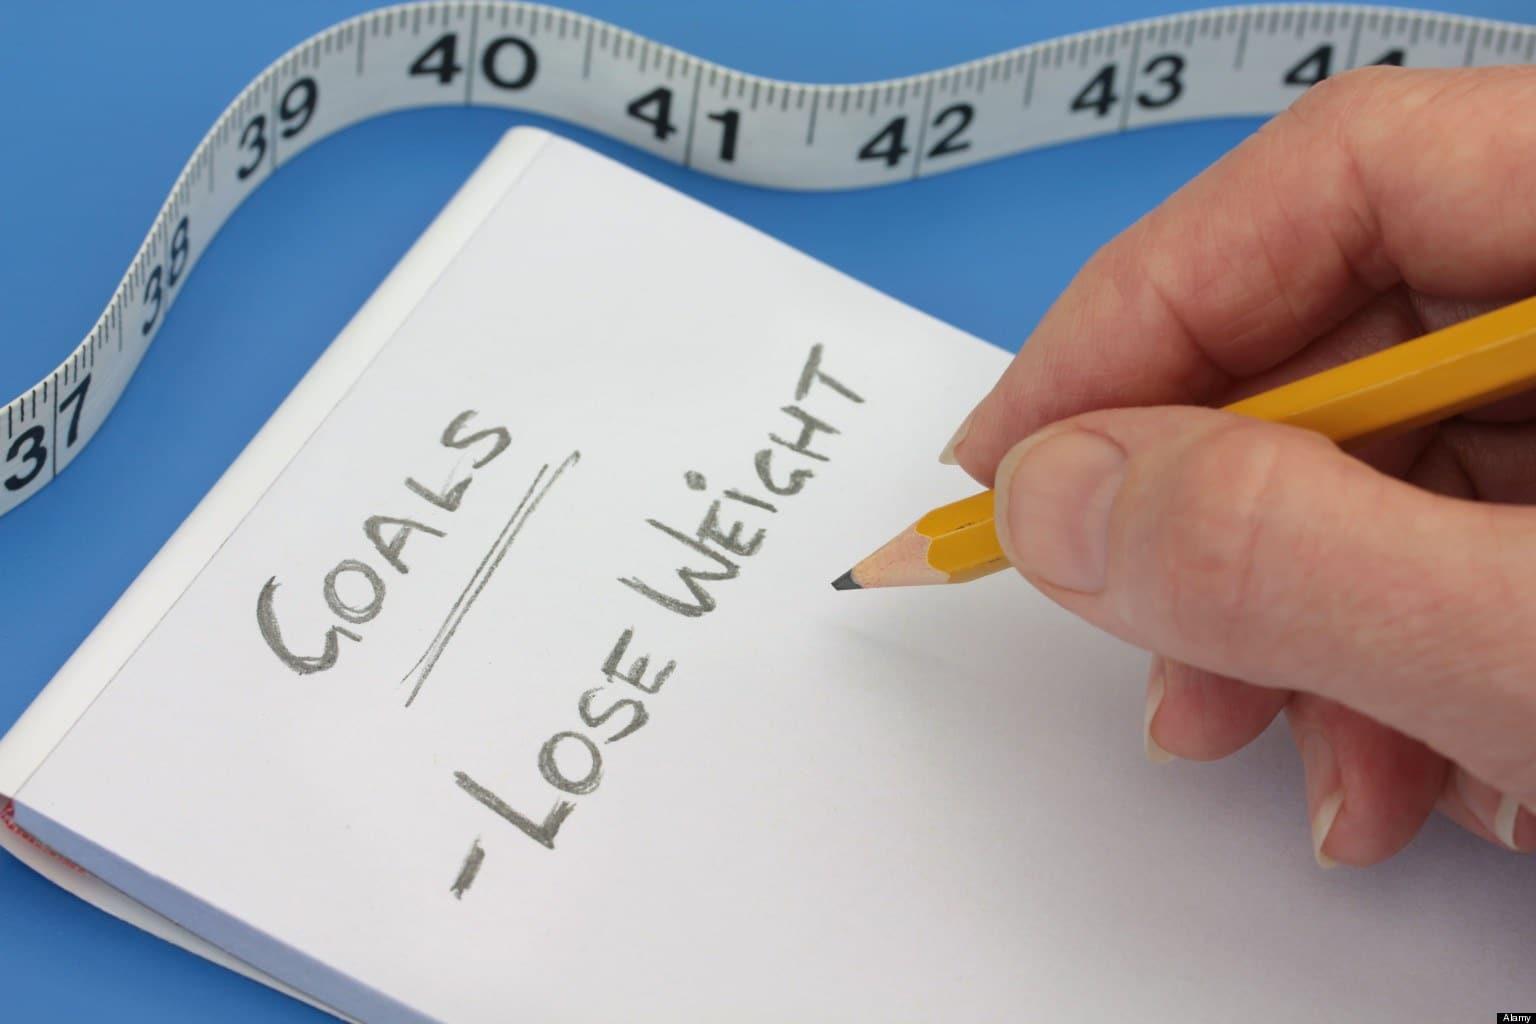 dieting mini goals